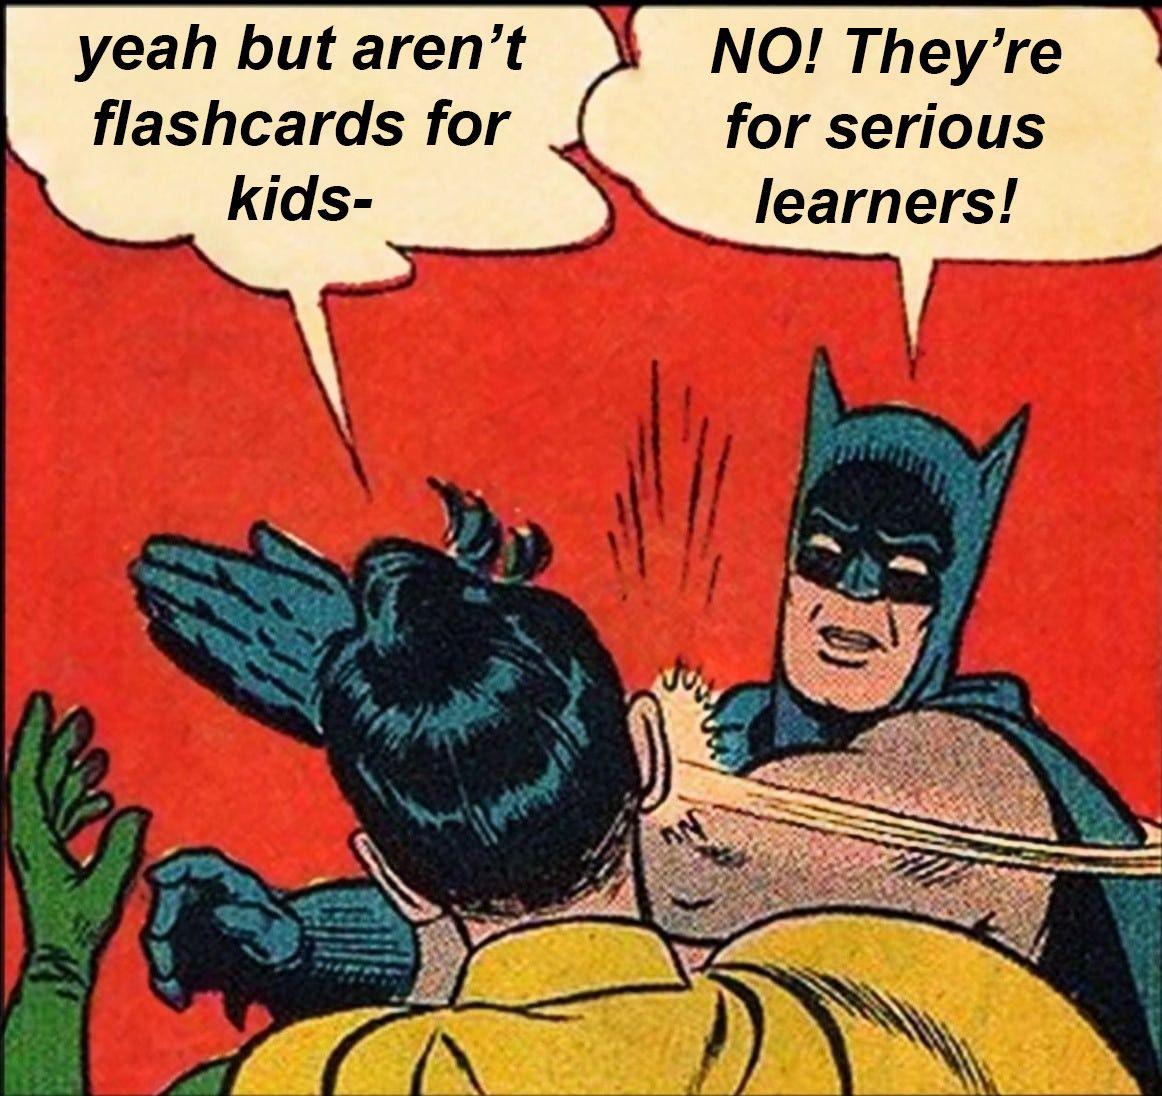 Comic image with batman